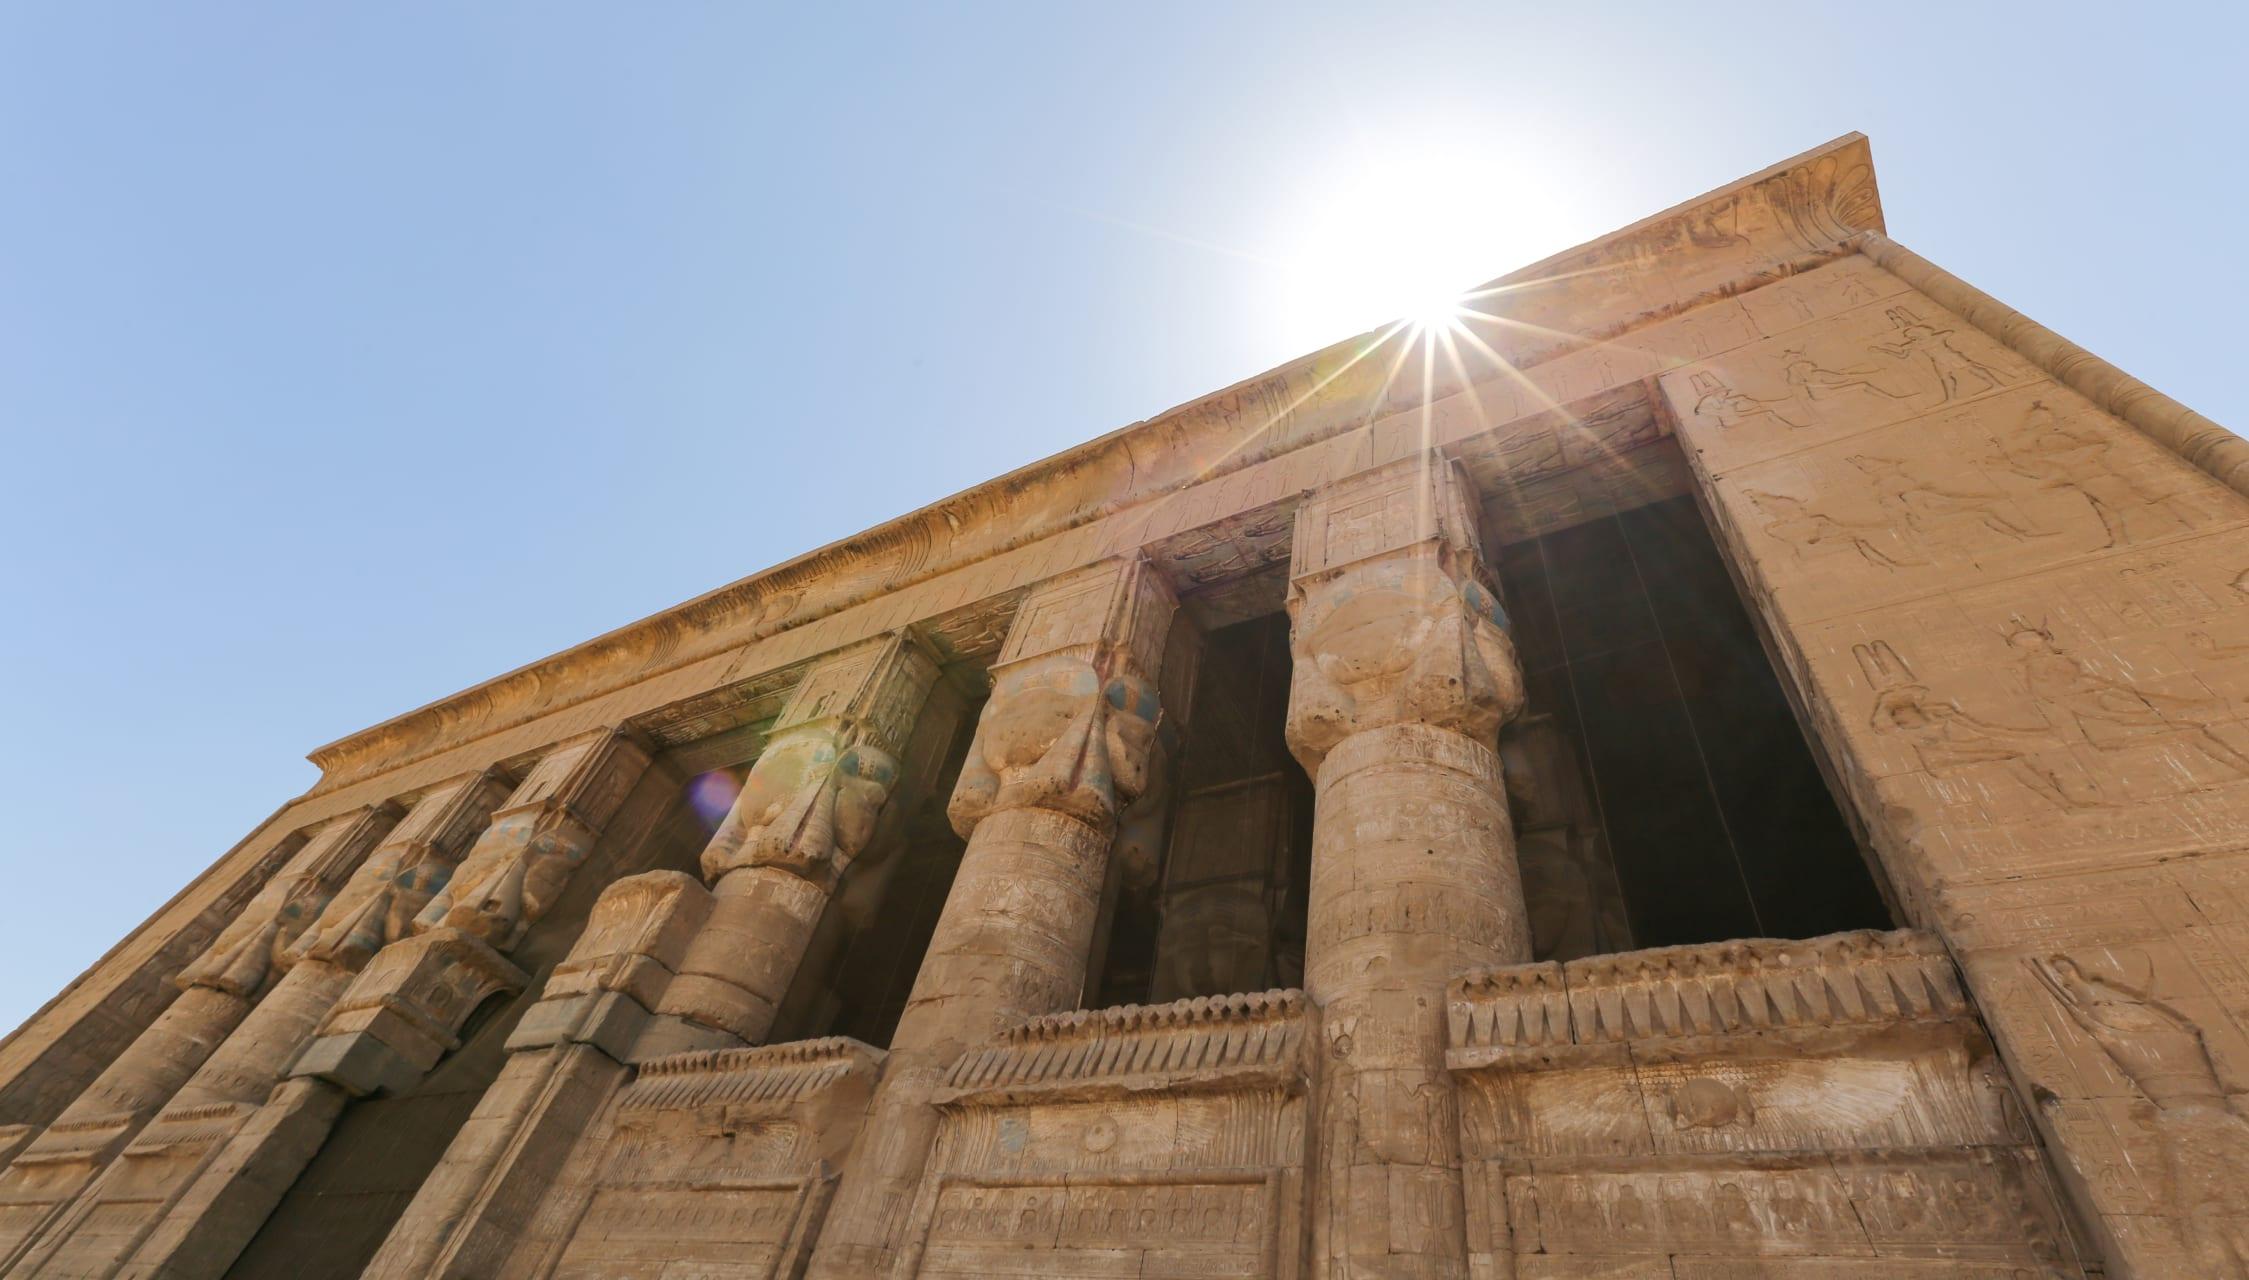 Luxor - Dendera Temple of The Goddess Hathor